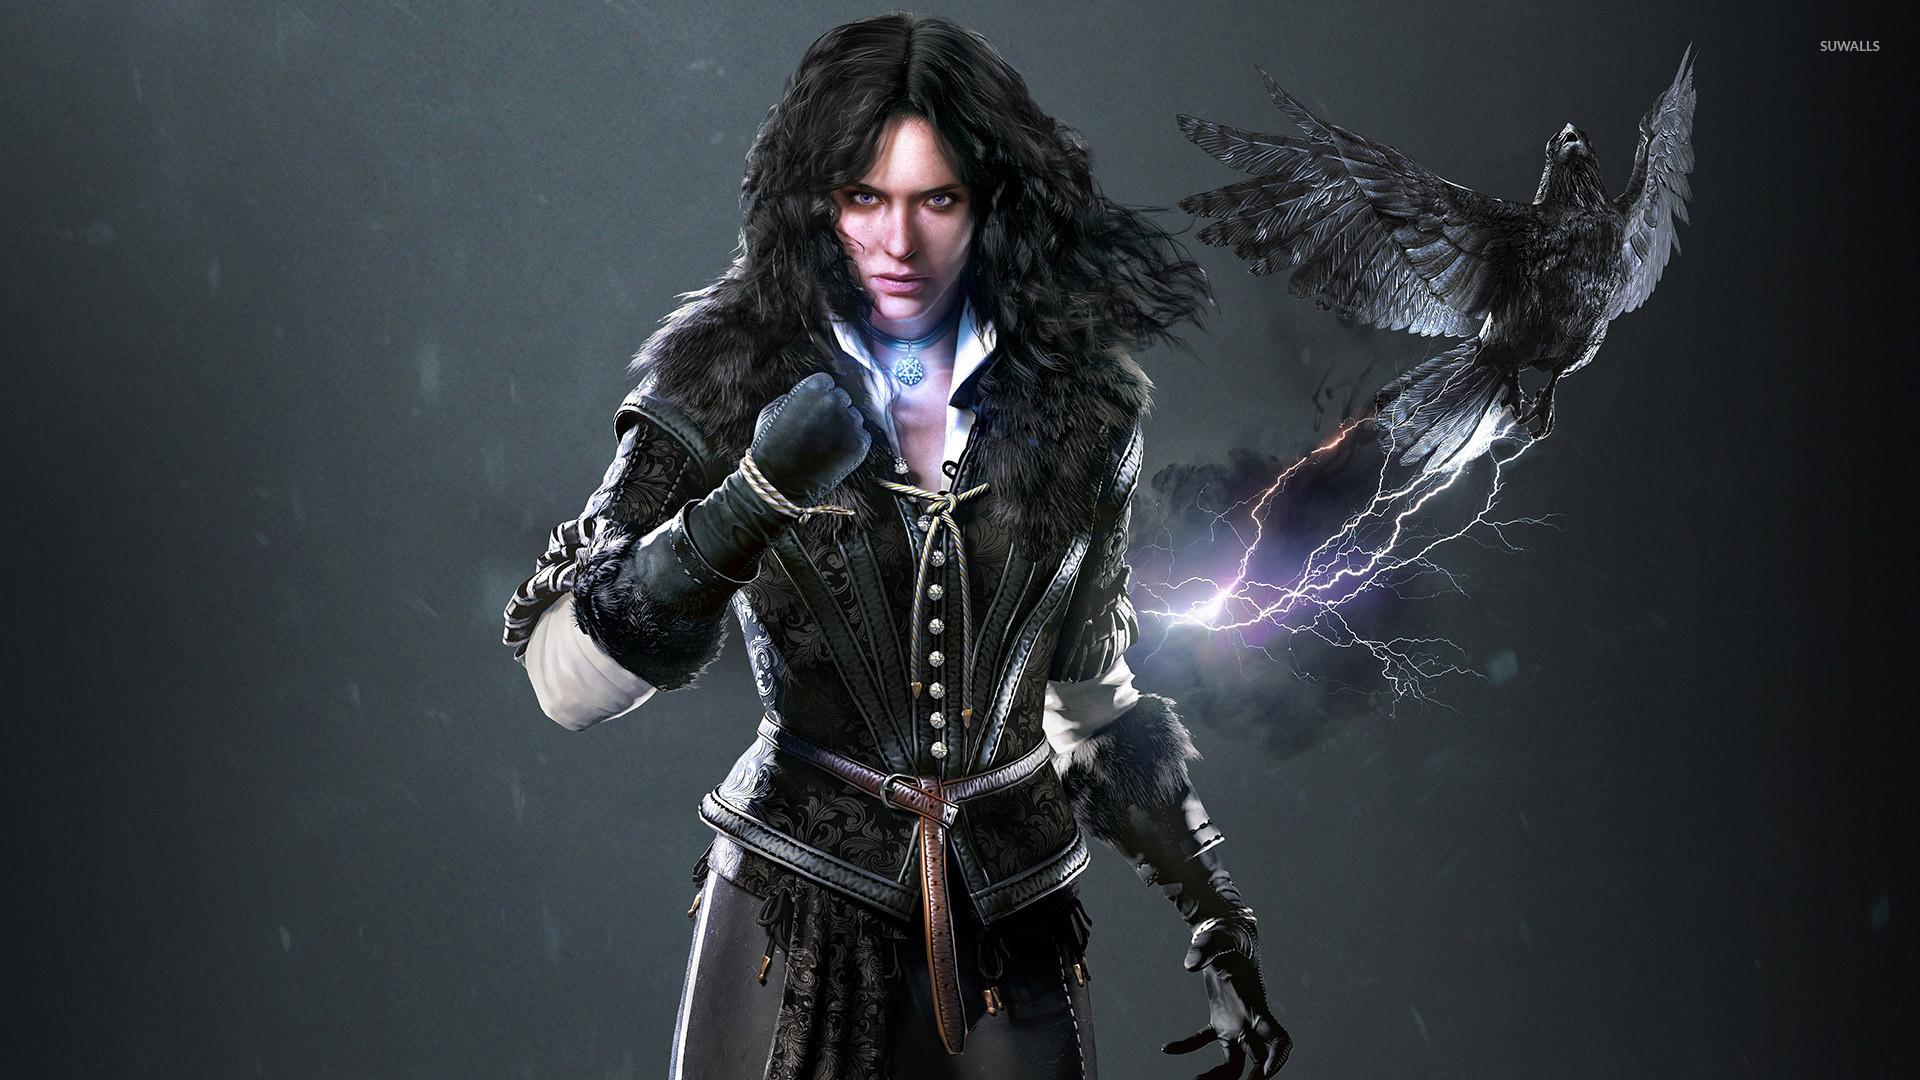 The Witcher 3: Wild Hunt [2] wallpaper jpg